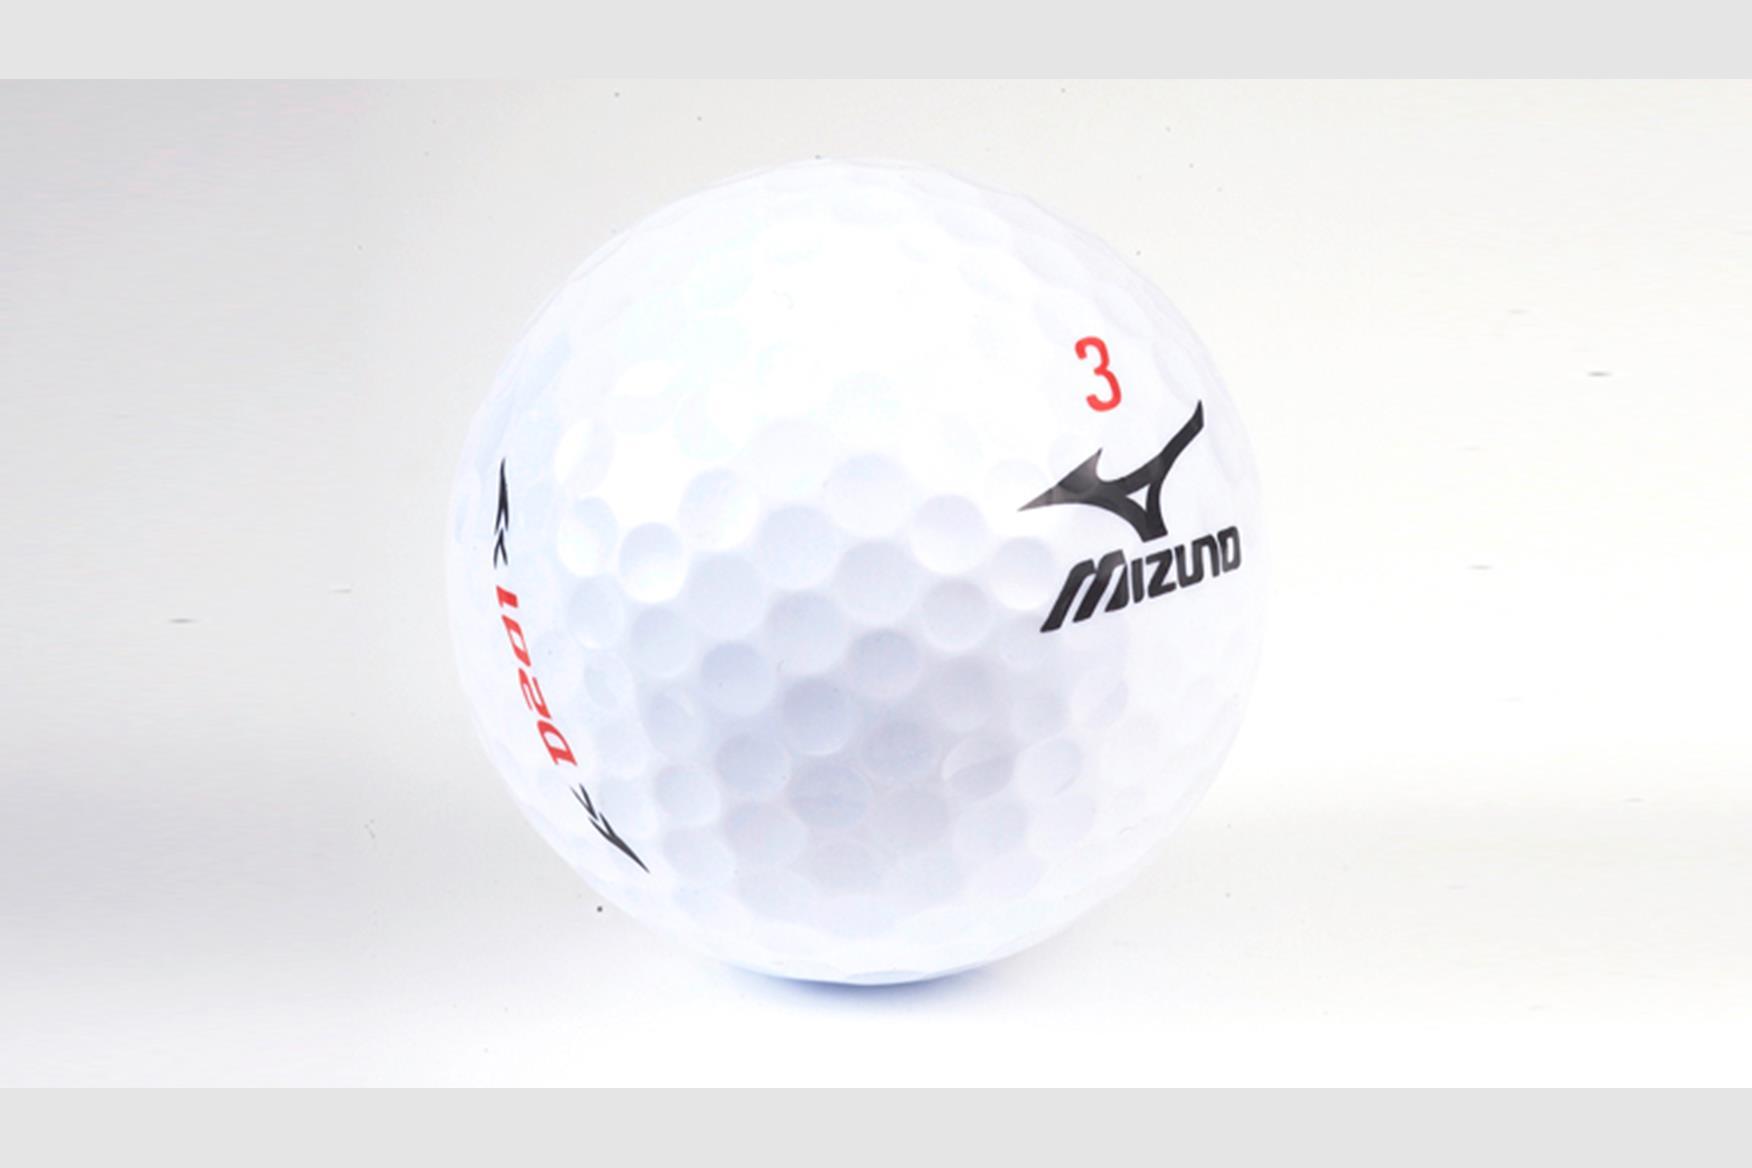 mizuno d201 golf balls review equipment reviews today u0027s golfer